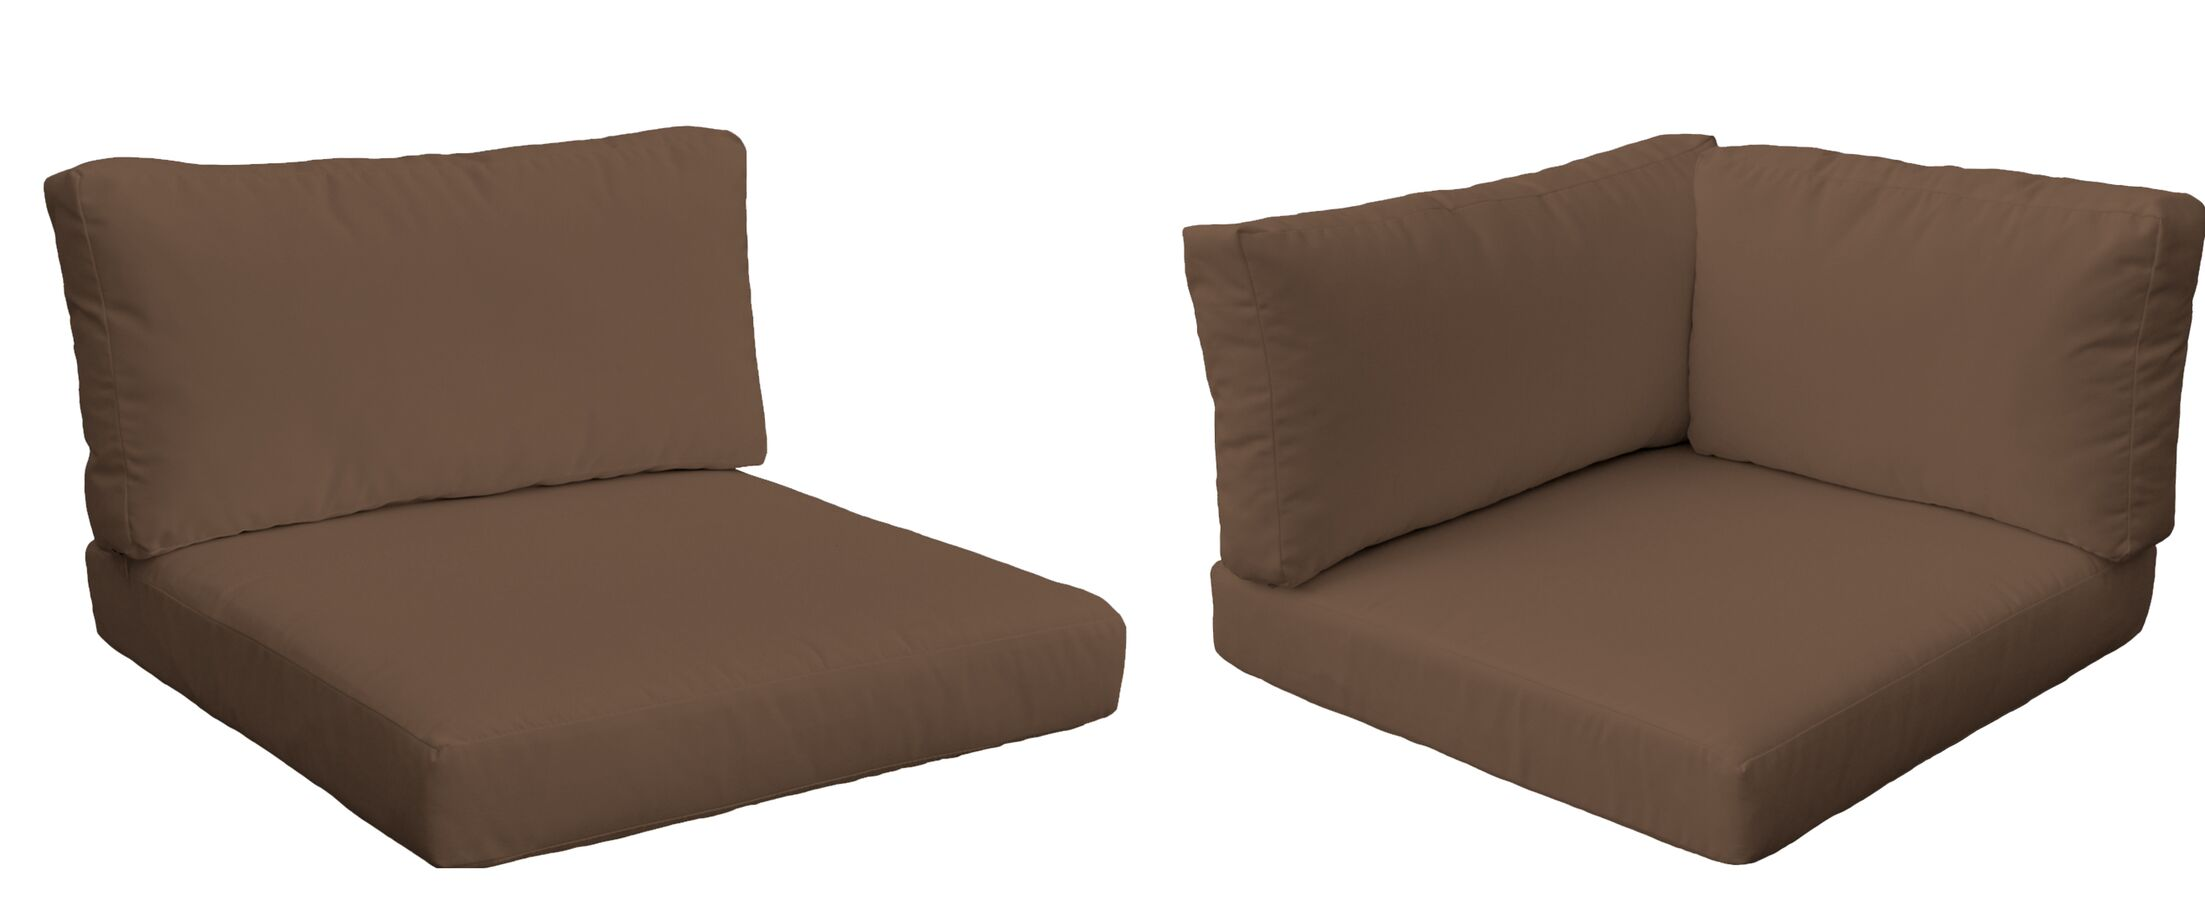 Monaco Outdoor 10 Piece Lounge Chair Cushion Set Fabric: Cocoa